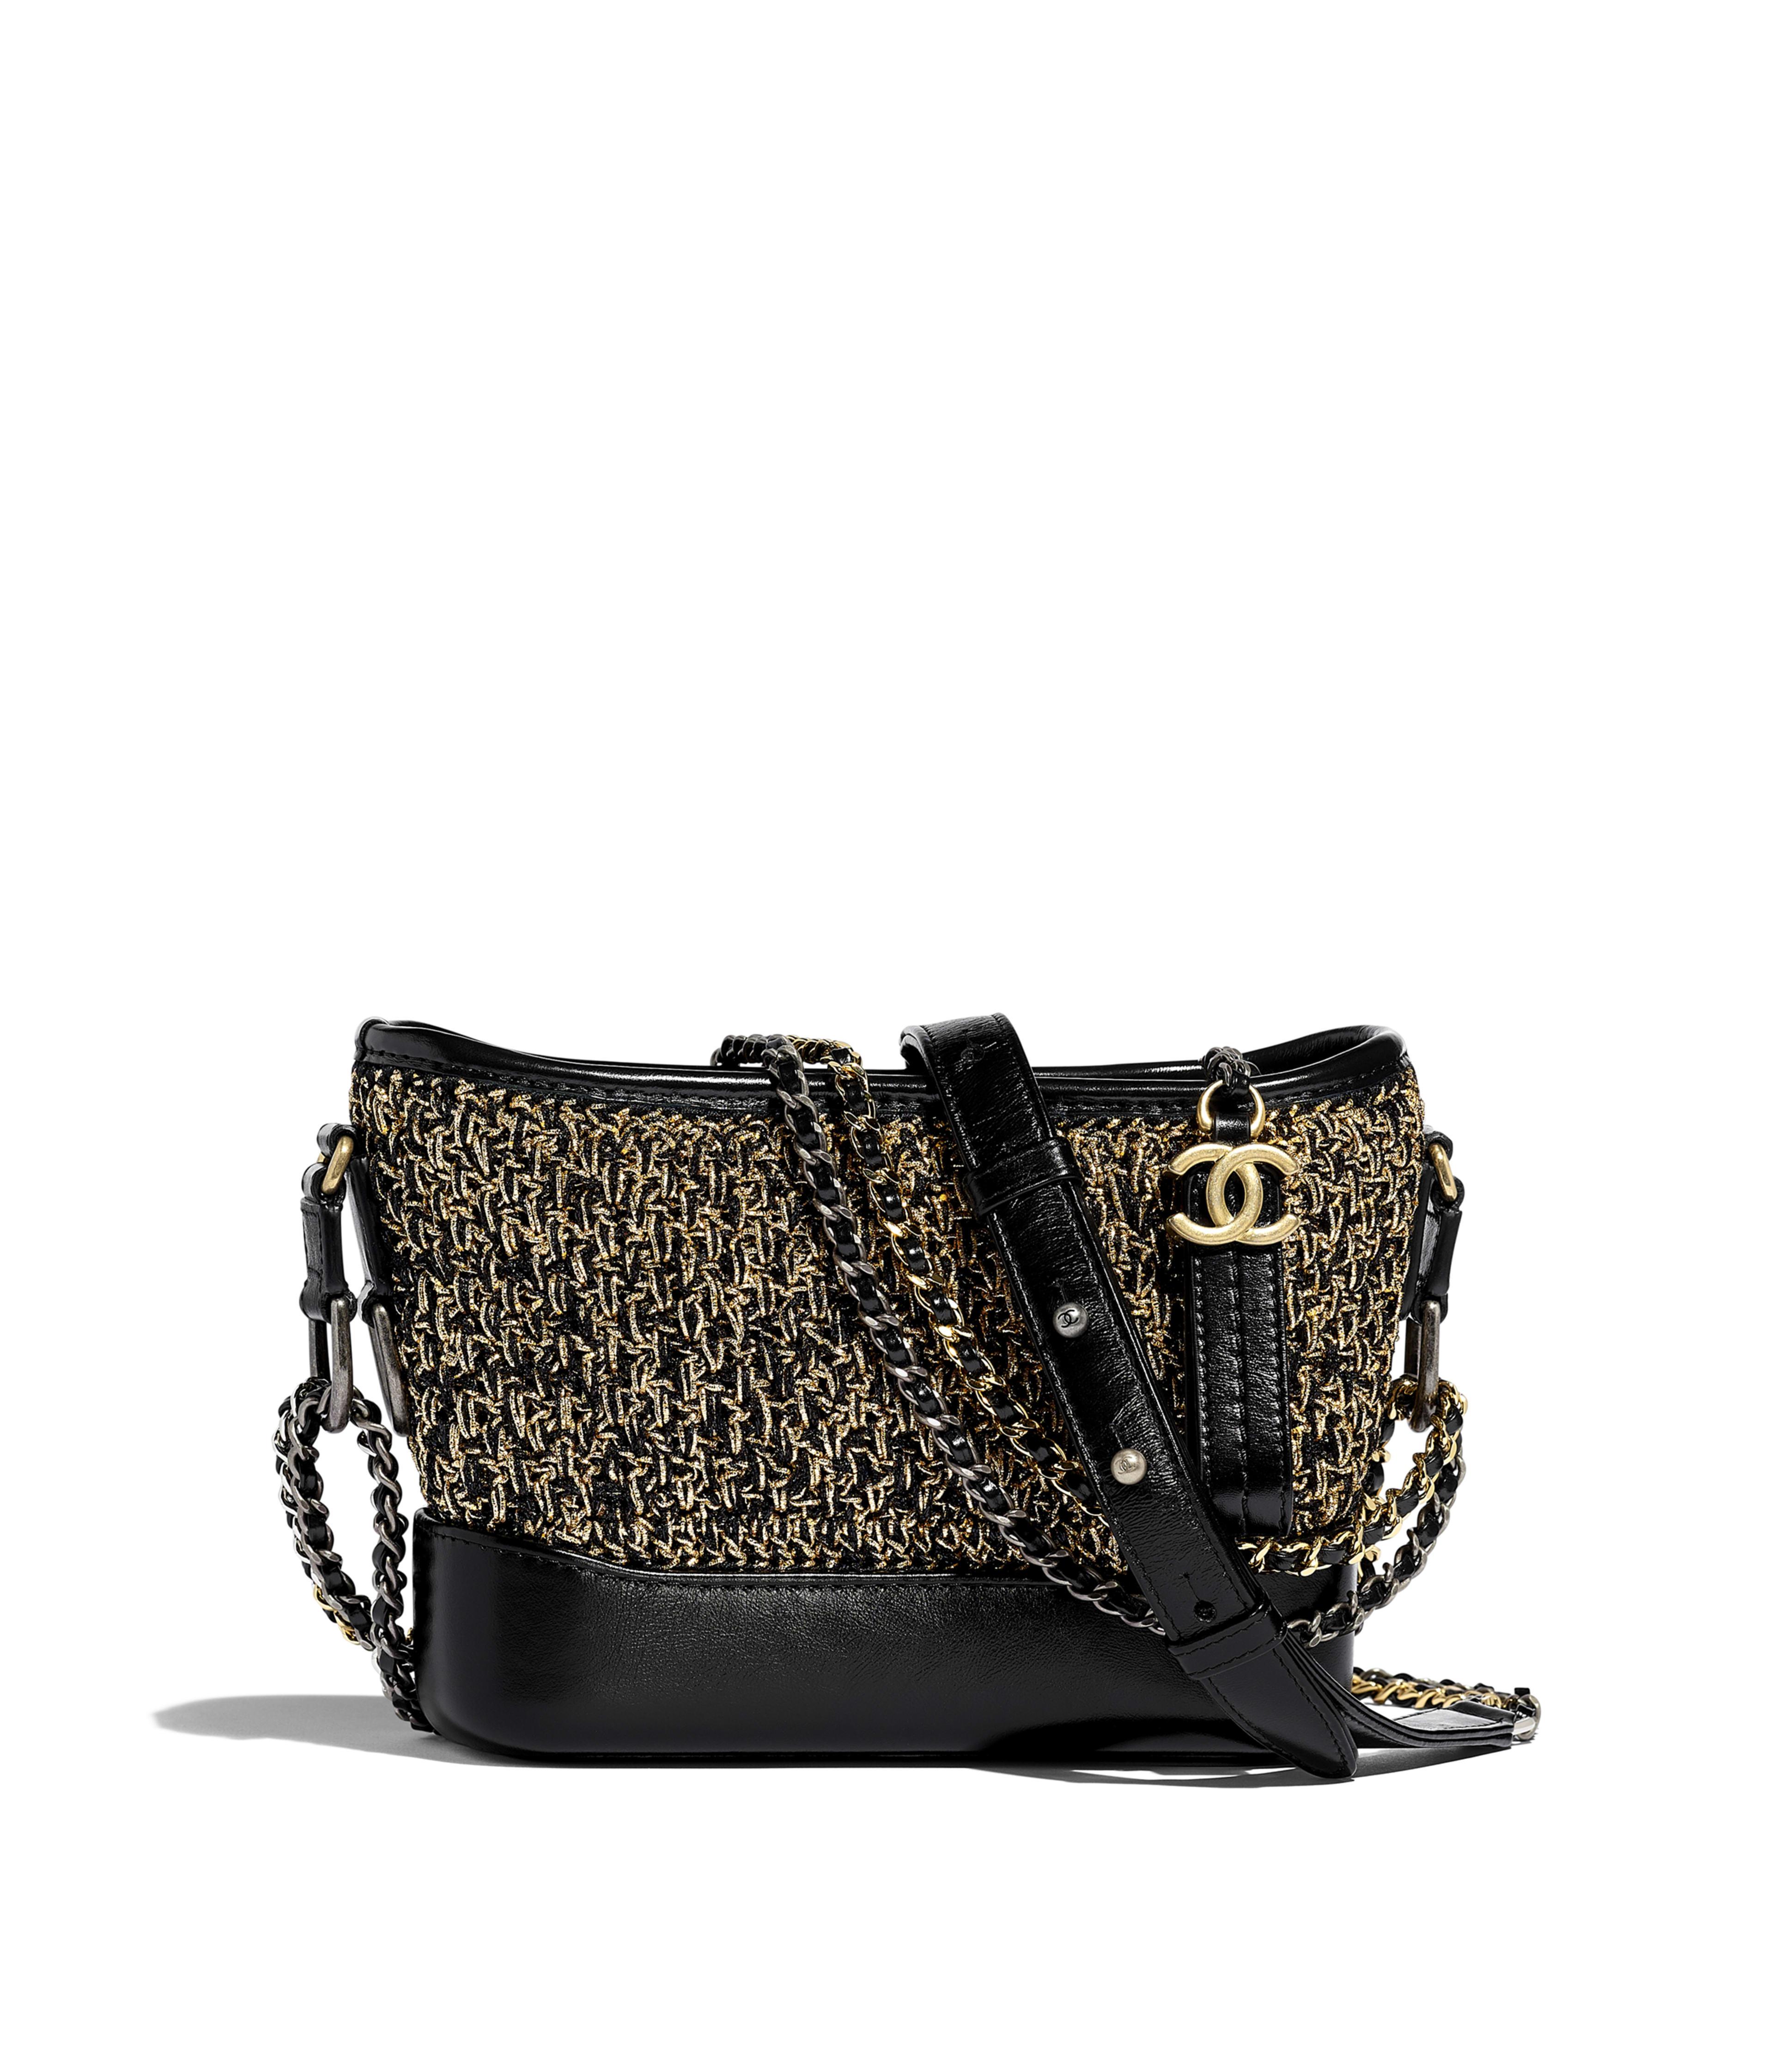 ac96491ca7 CHANEL'S GABRIELLE Small Hobo Bag Cotton, Calfskin, Gold-Tone & Silver-Tone  Metal, Black & Gold Ref. A91810B00953N0784